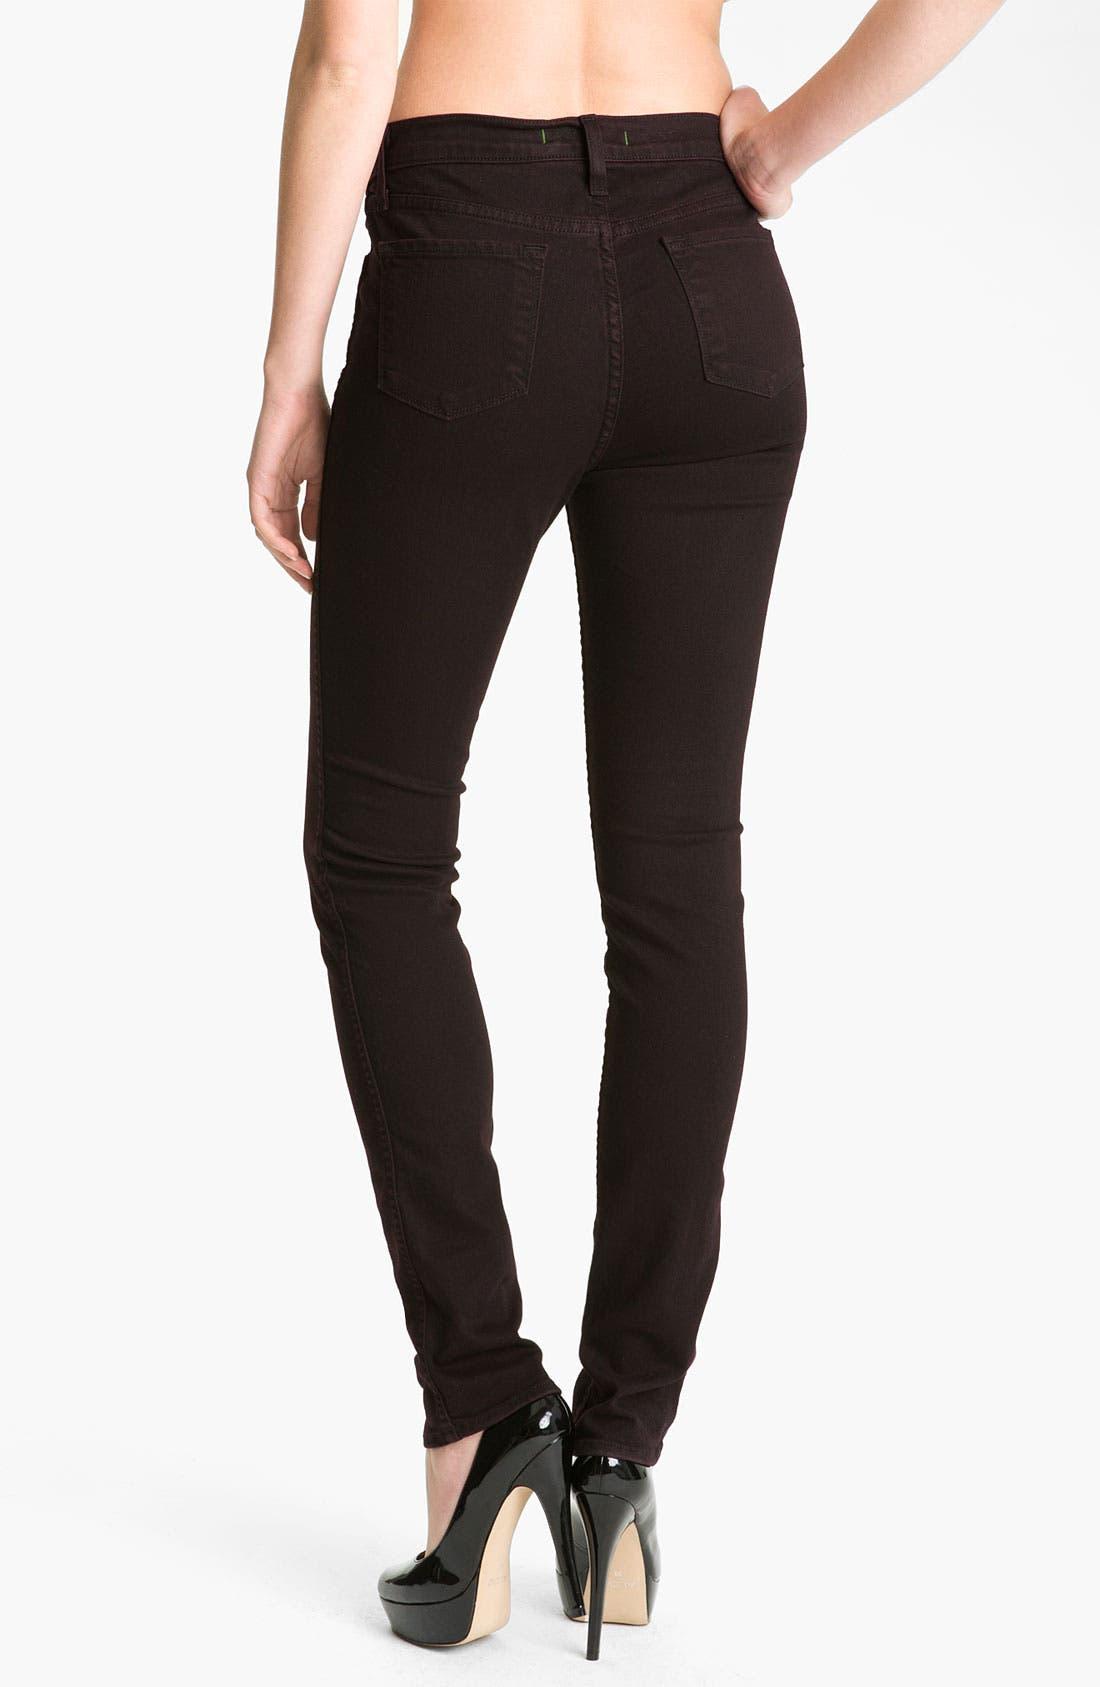 Alternate Image 2  - J Brand 'Sasha' High Rise Skinny Jeans (Noir Red)